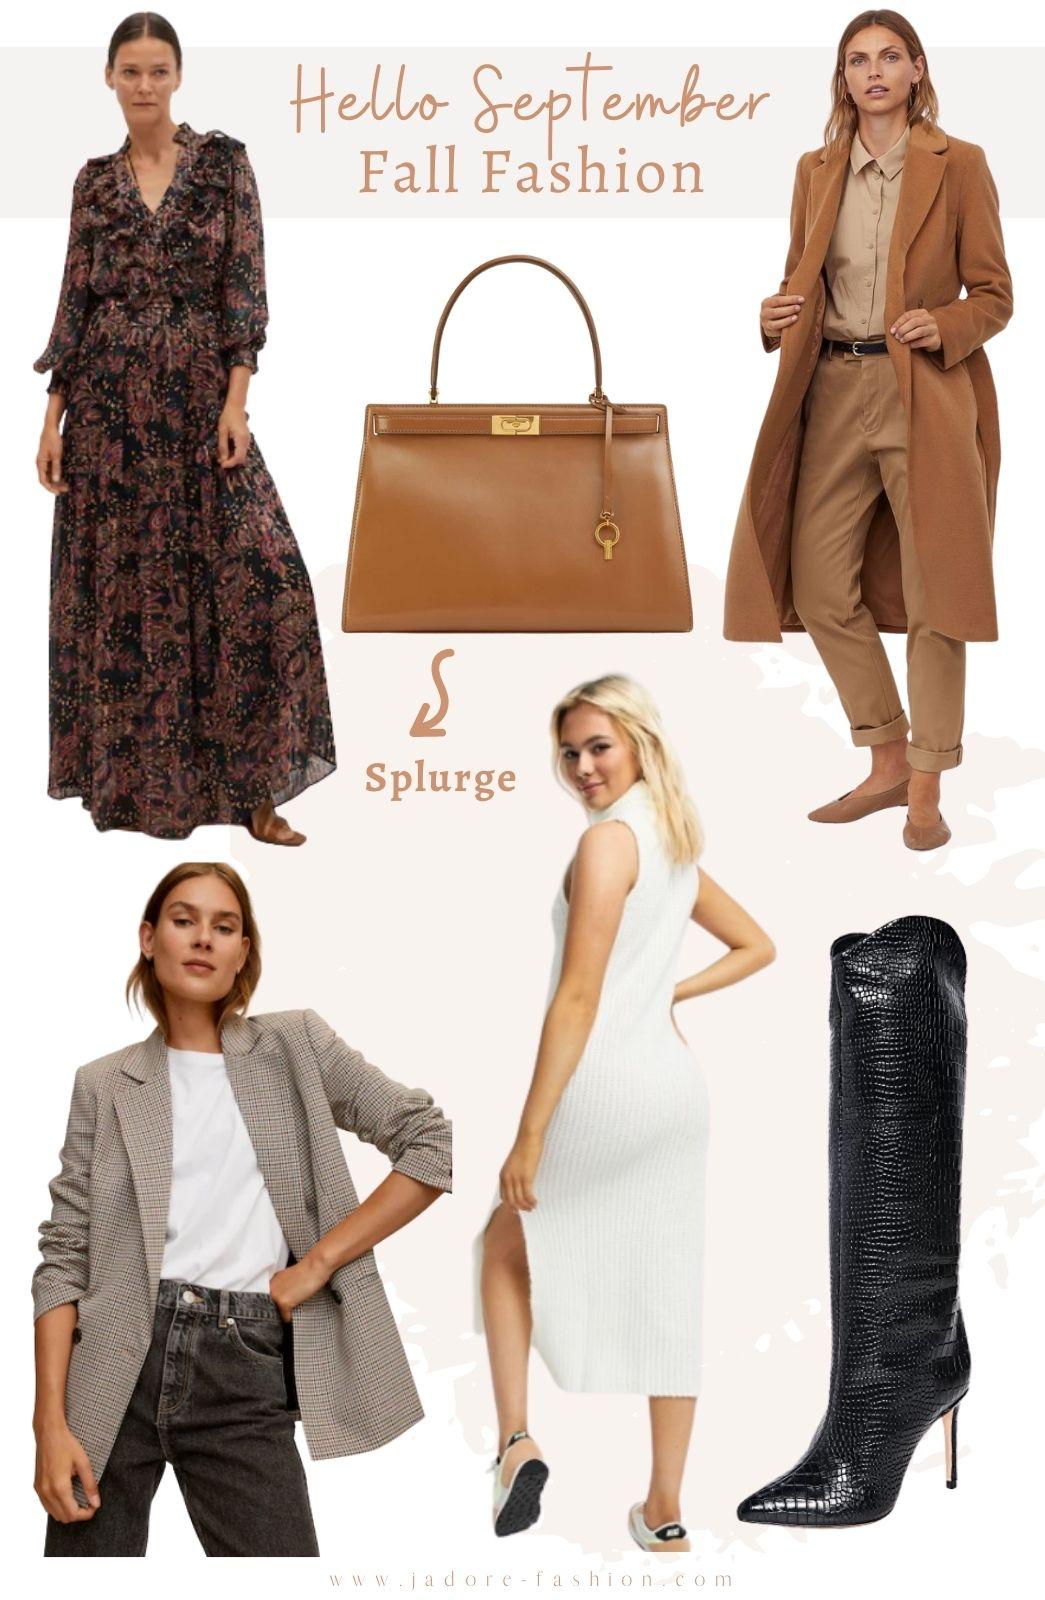 stella-adewunmi-of-jadore-fashion-blog-shares-fall-favorites-labor-day-sales